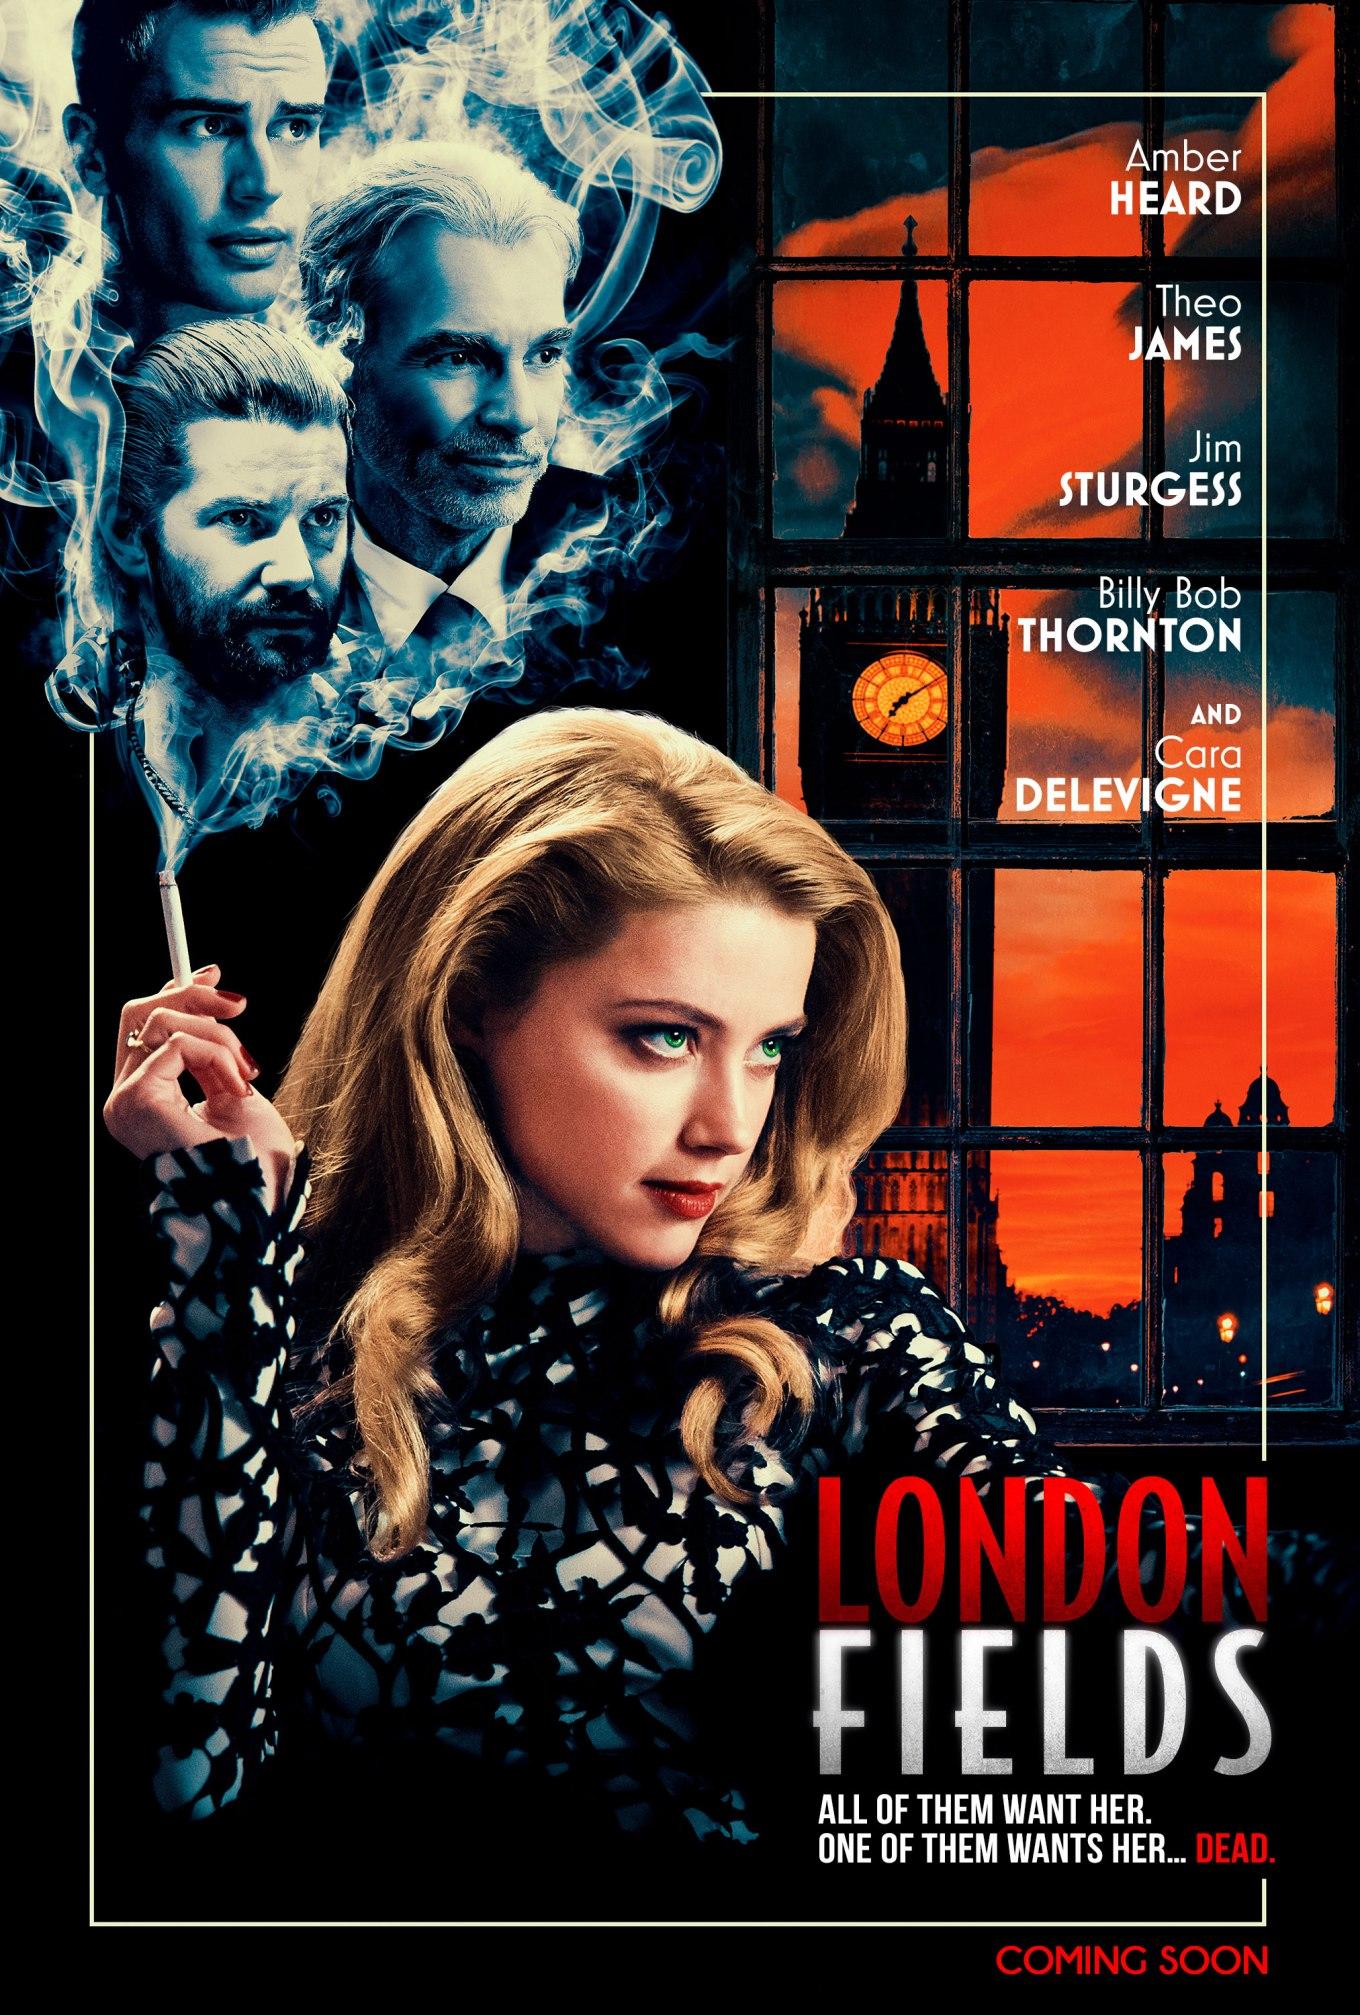 LondonFieldsPoster